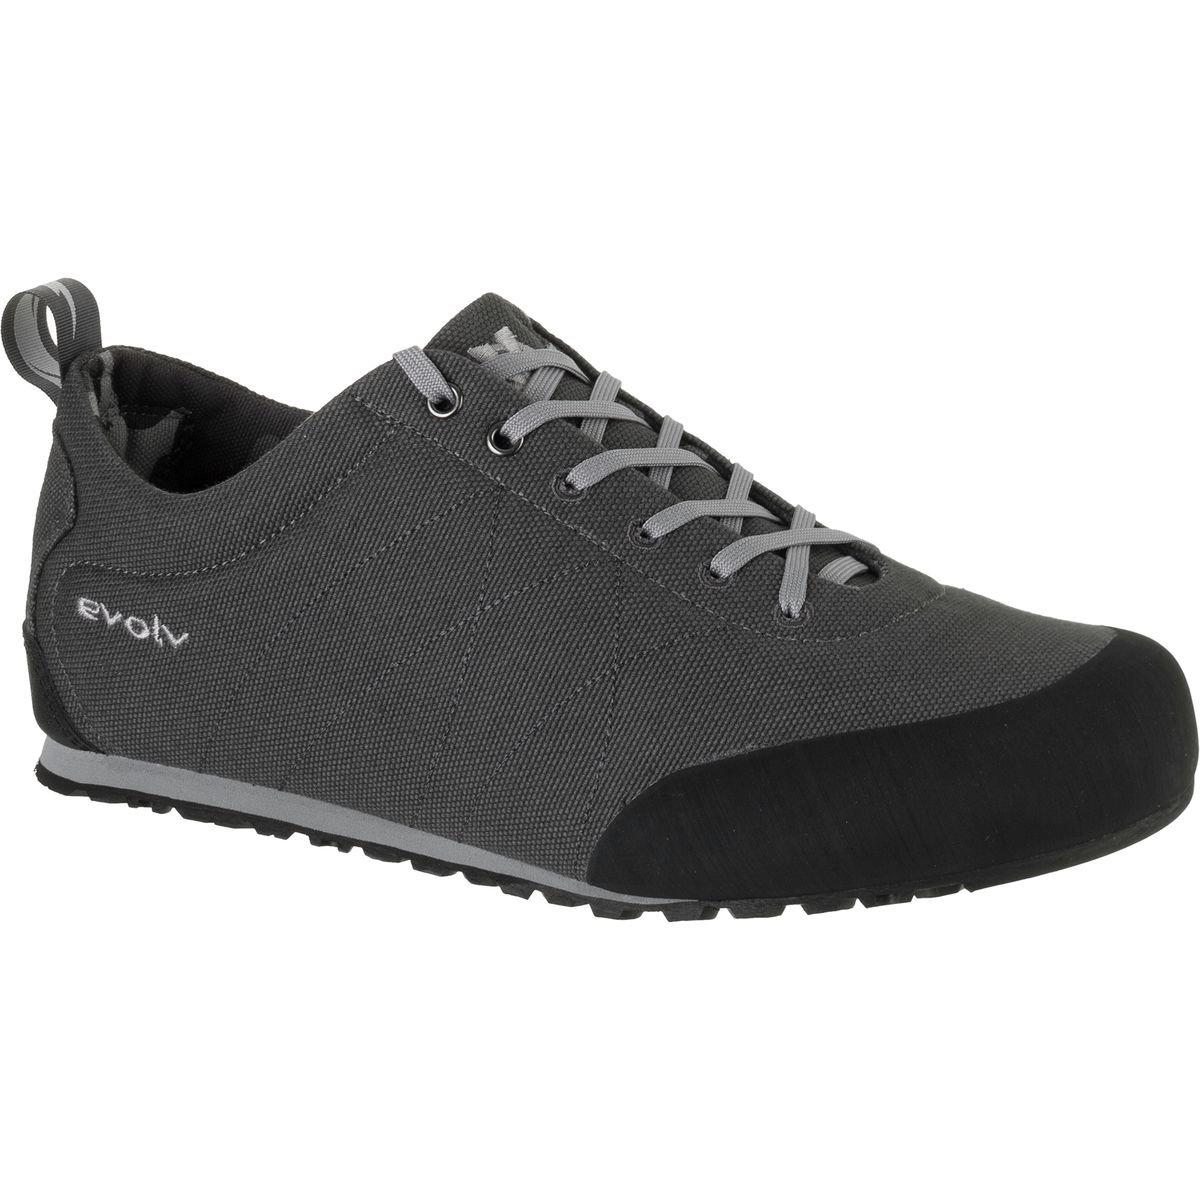 Evolv Cruzer Psyche Approach Shoe EVL0234-10.5